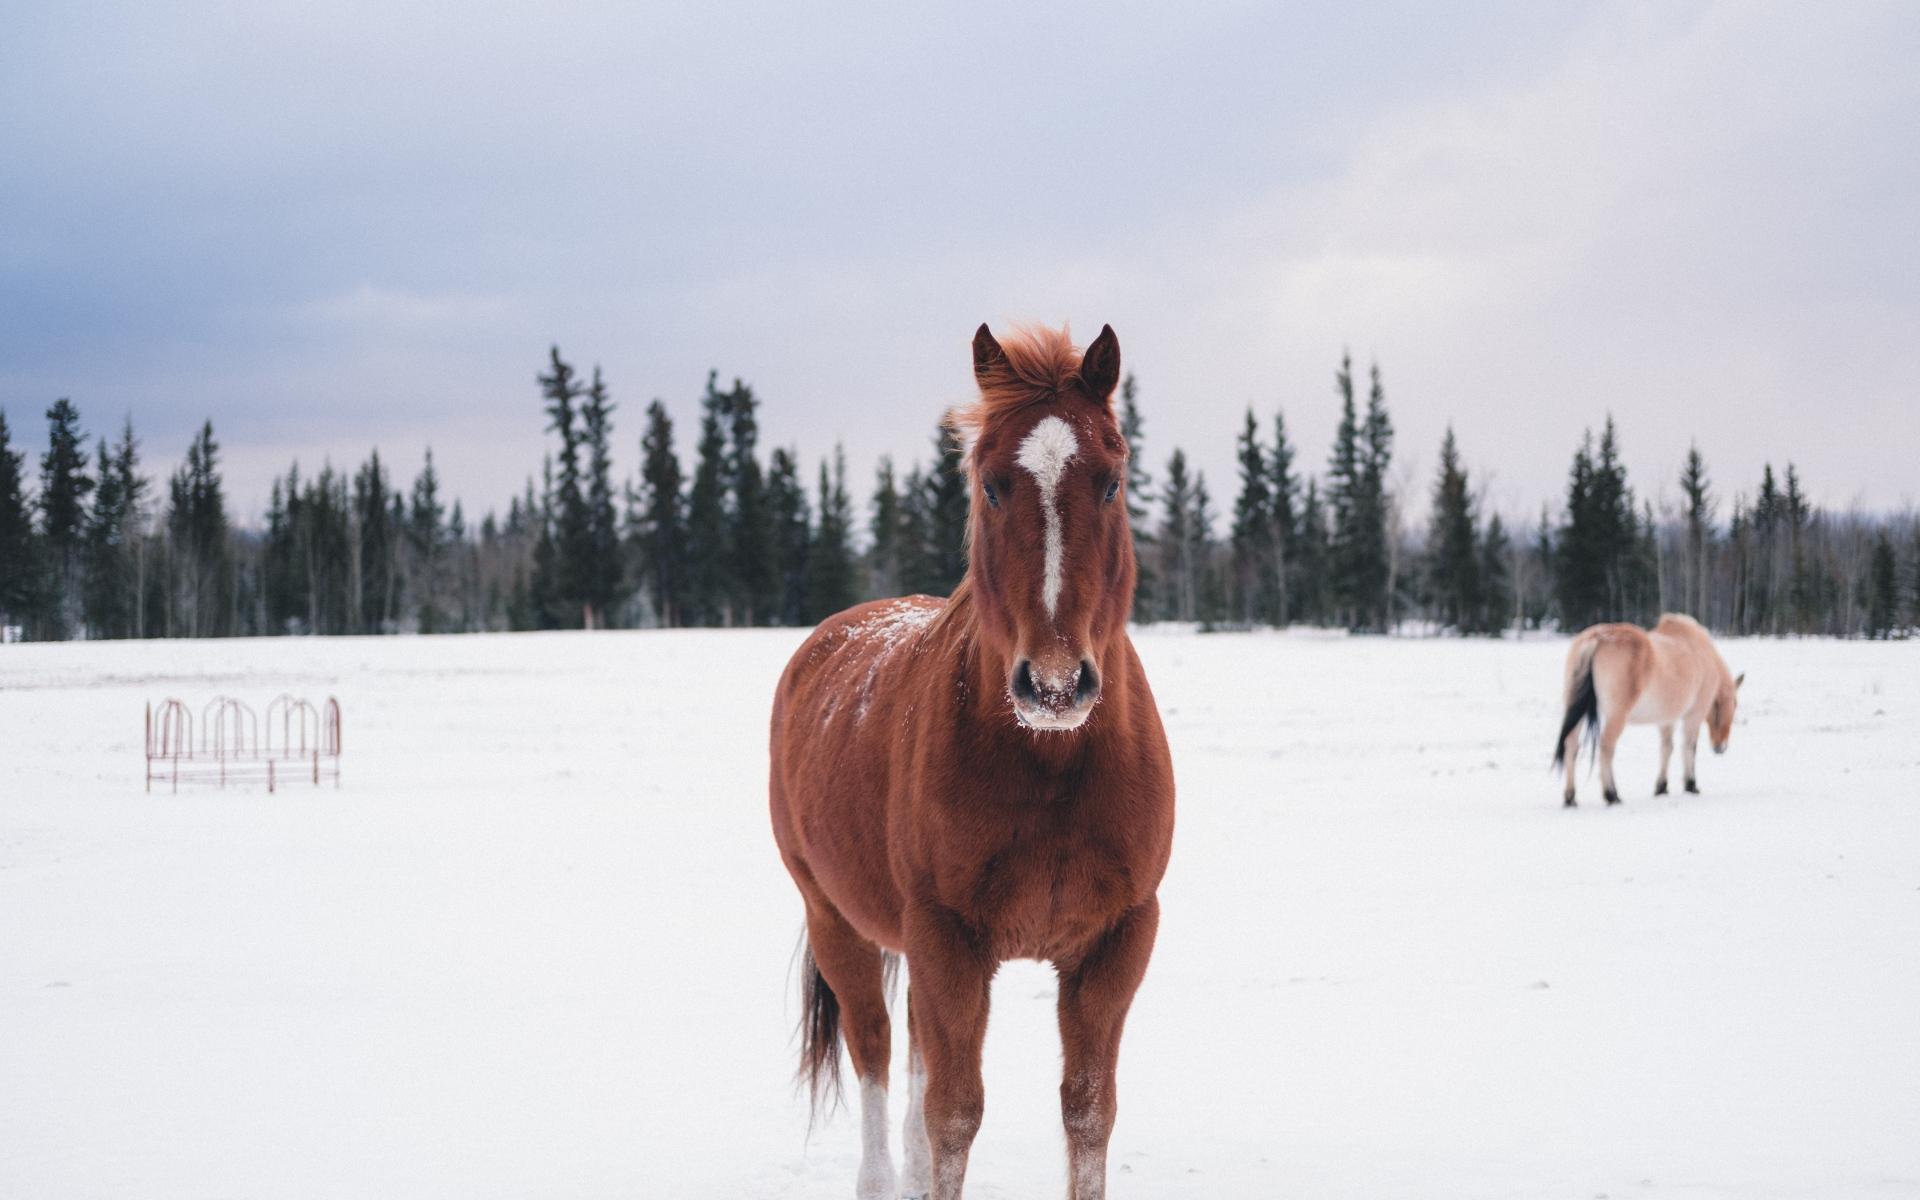 HDoboi.Kiev.ua - Коричневый конь зимой у леса, лошади зима обои